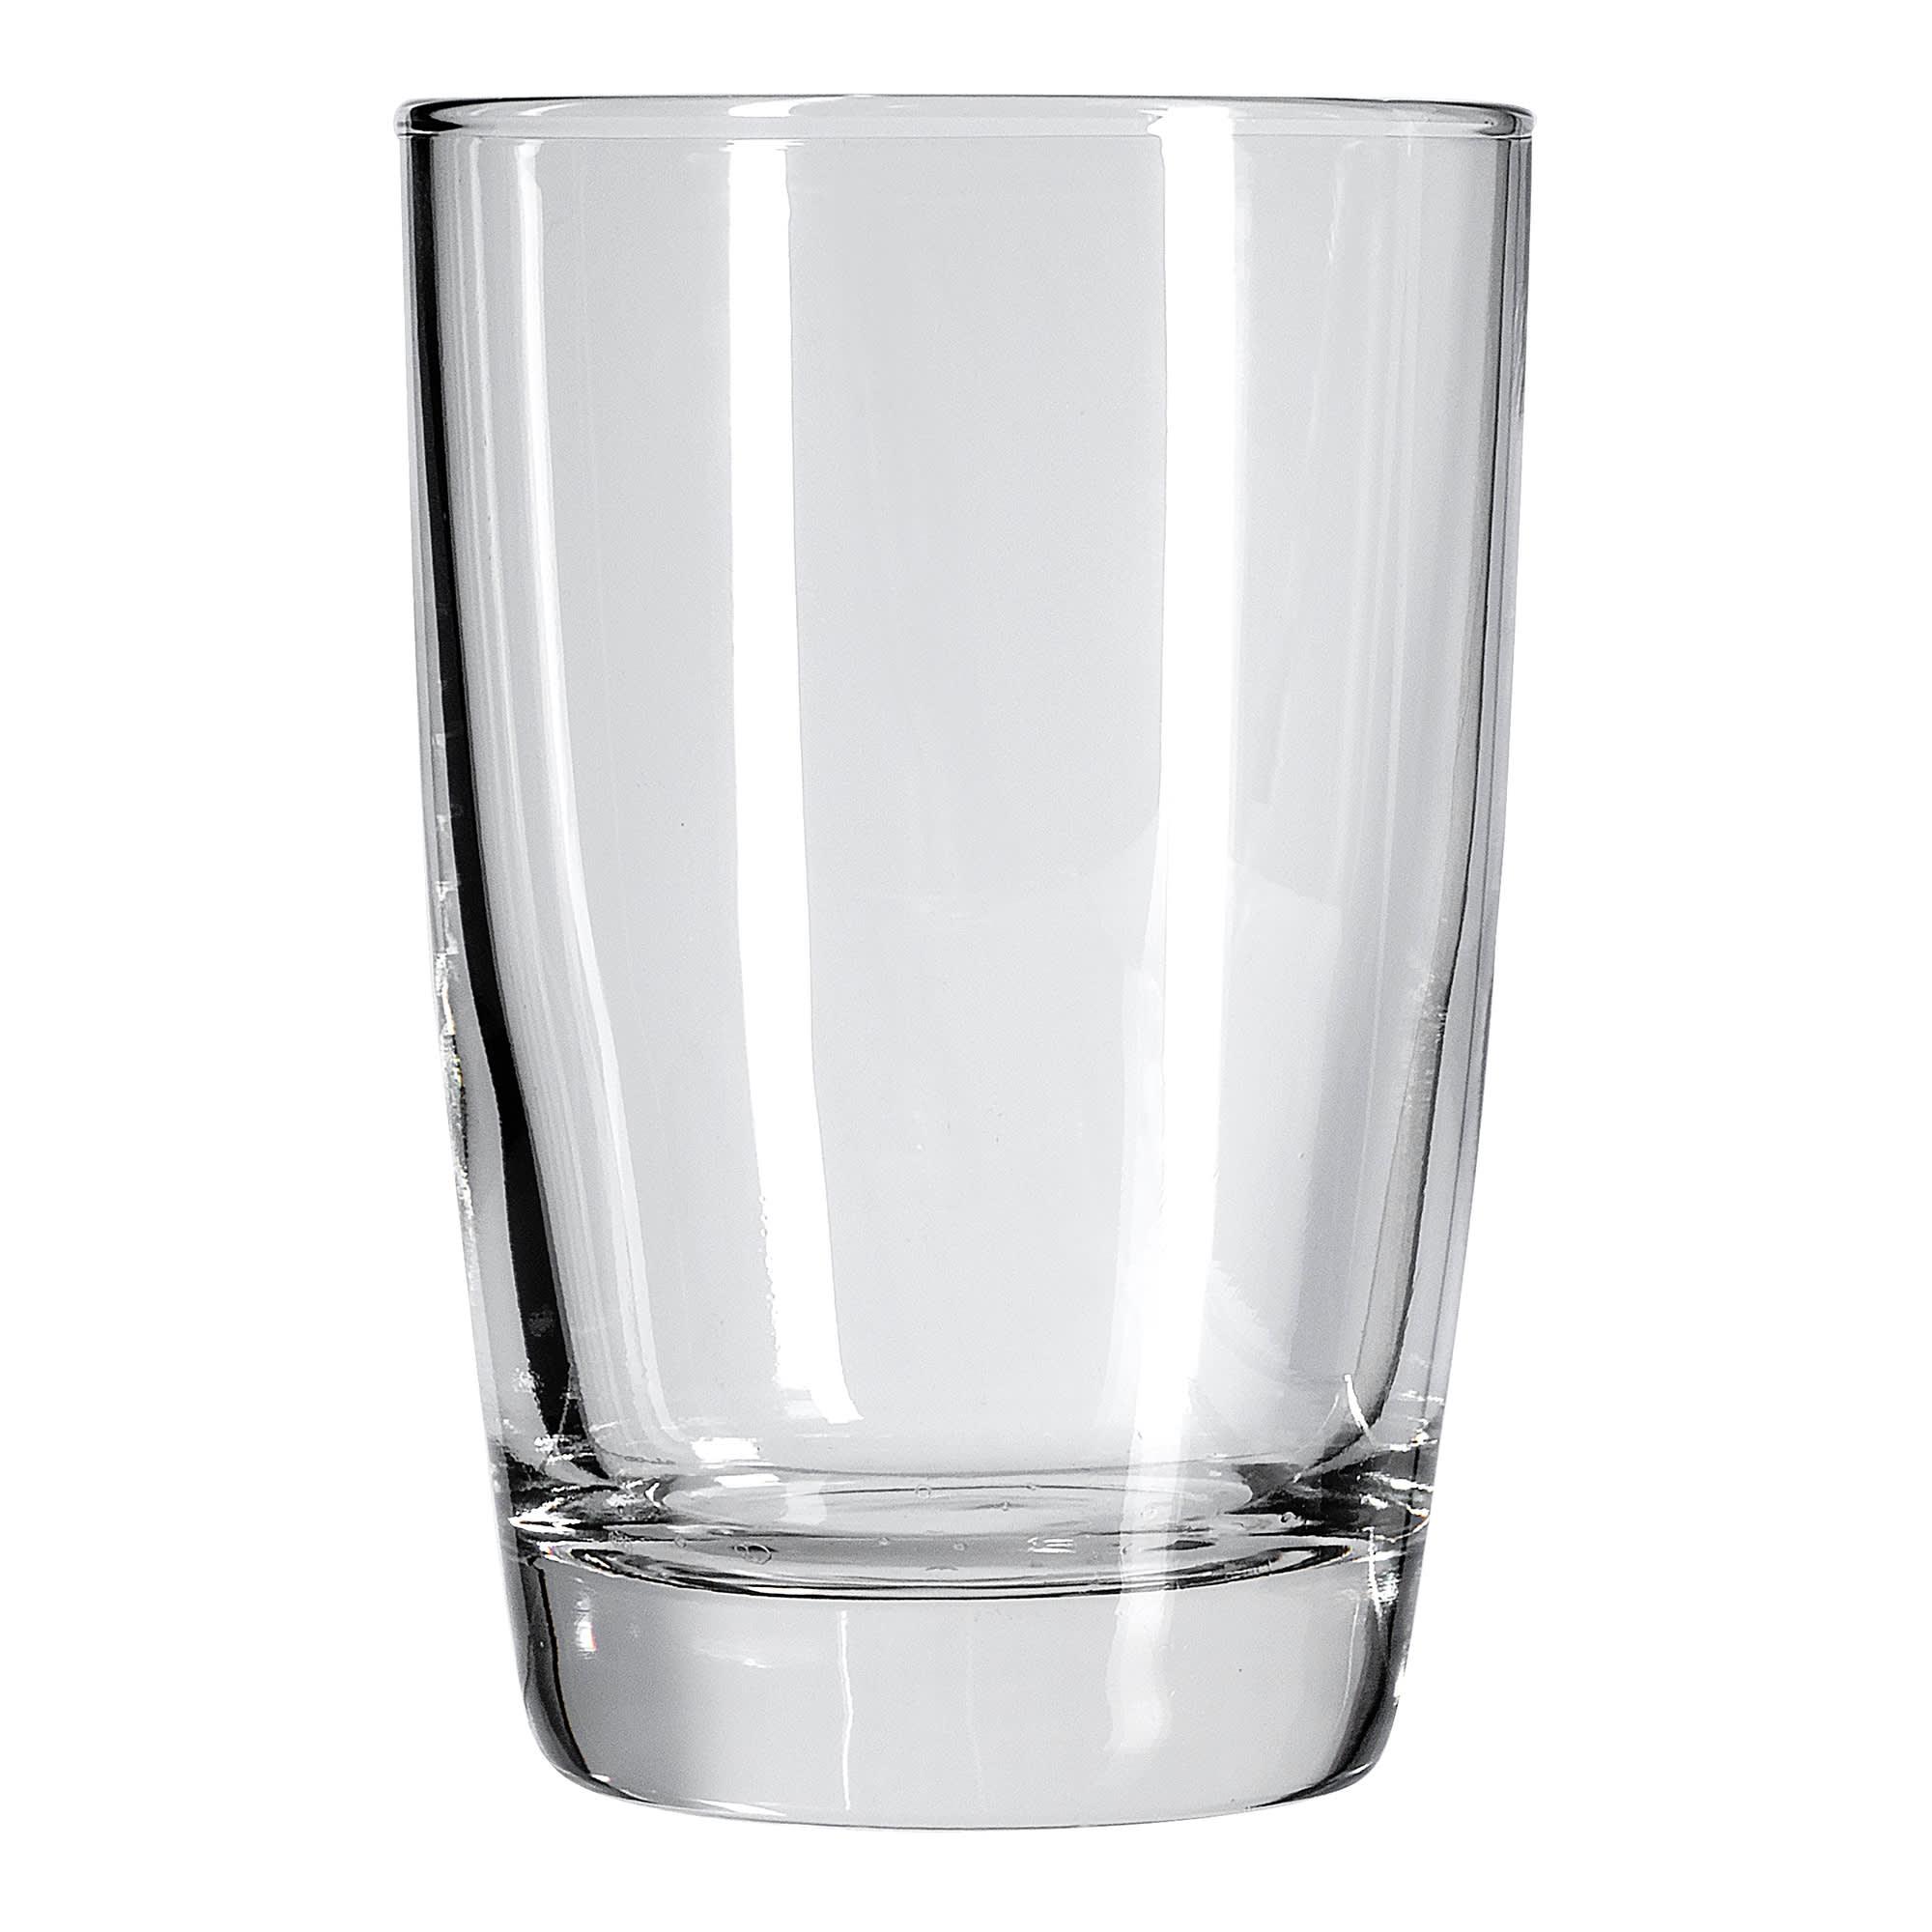 Libbey 12259 6 oz Embassy Juice Glass - Safedge Rim